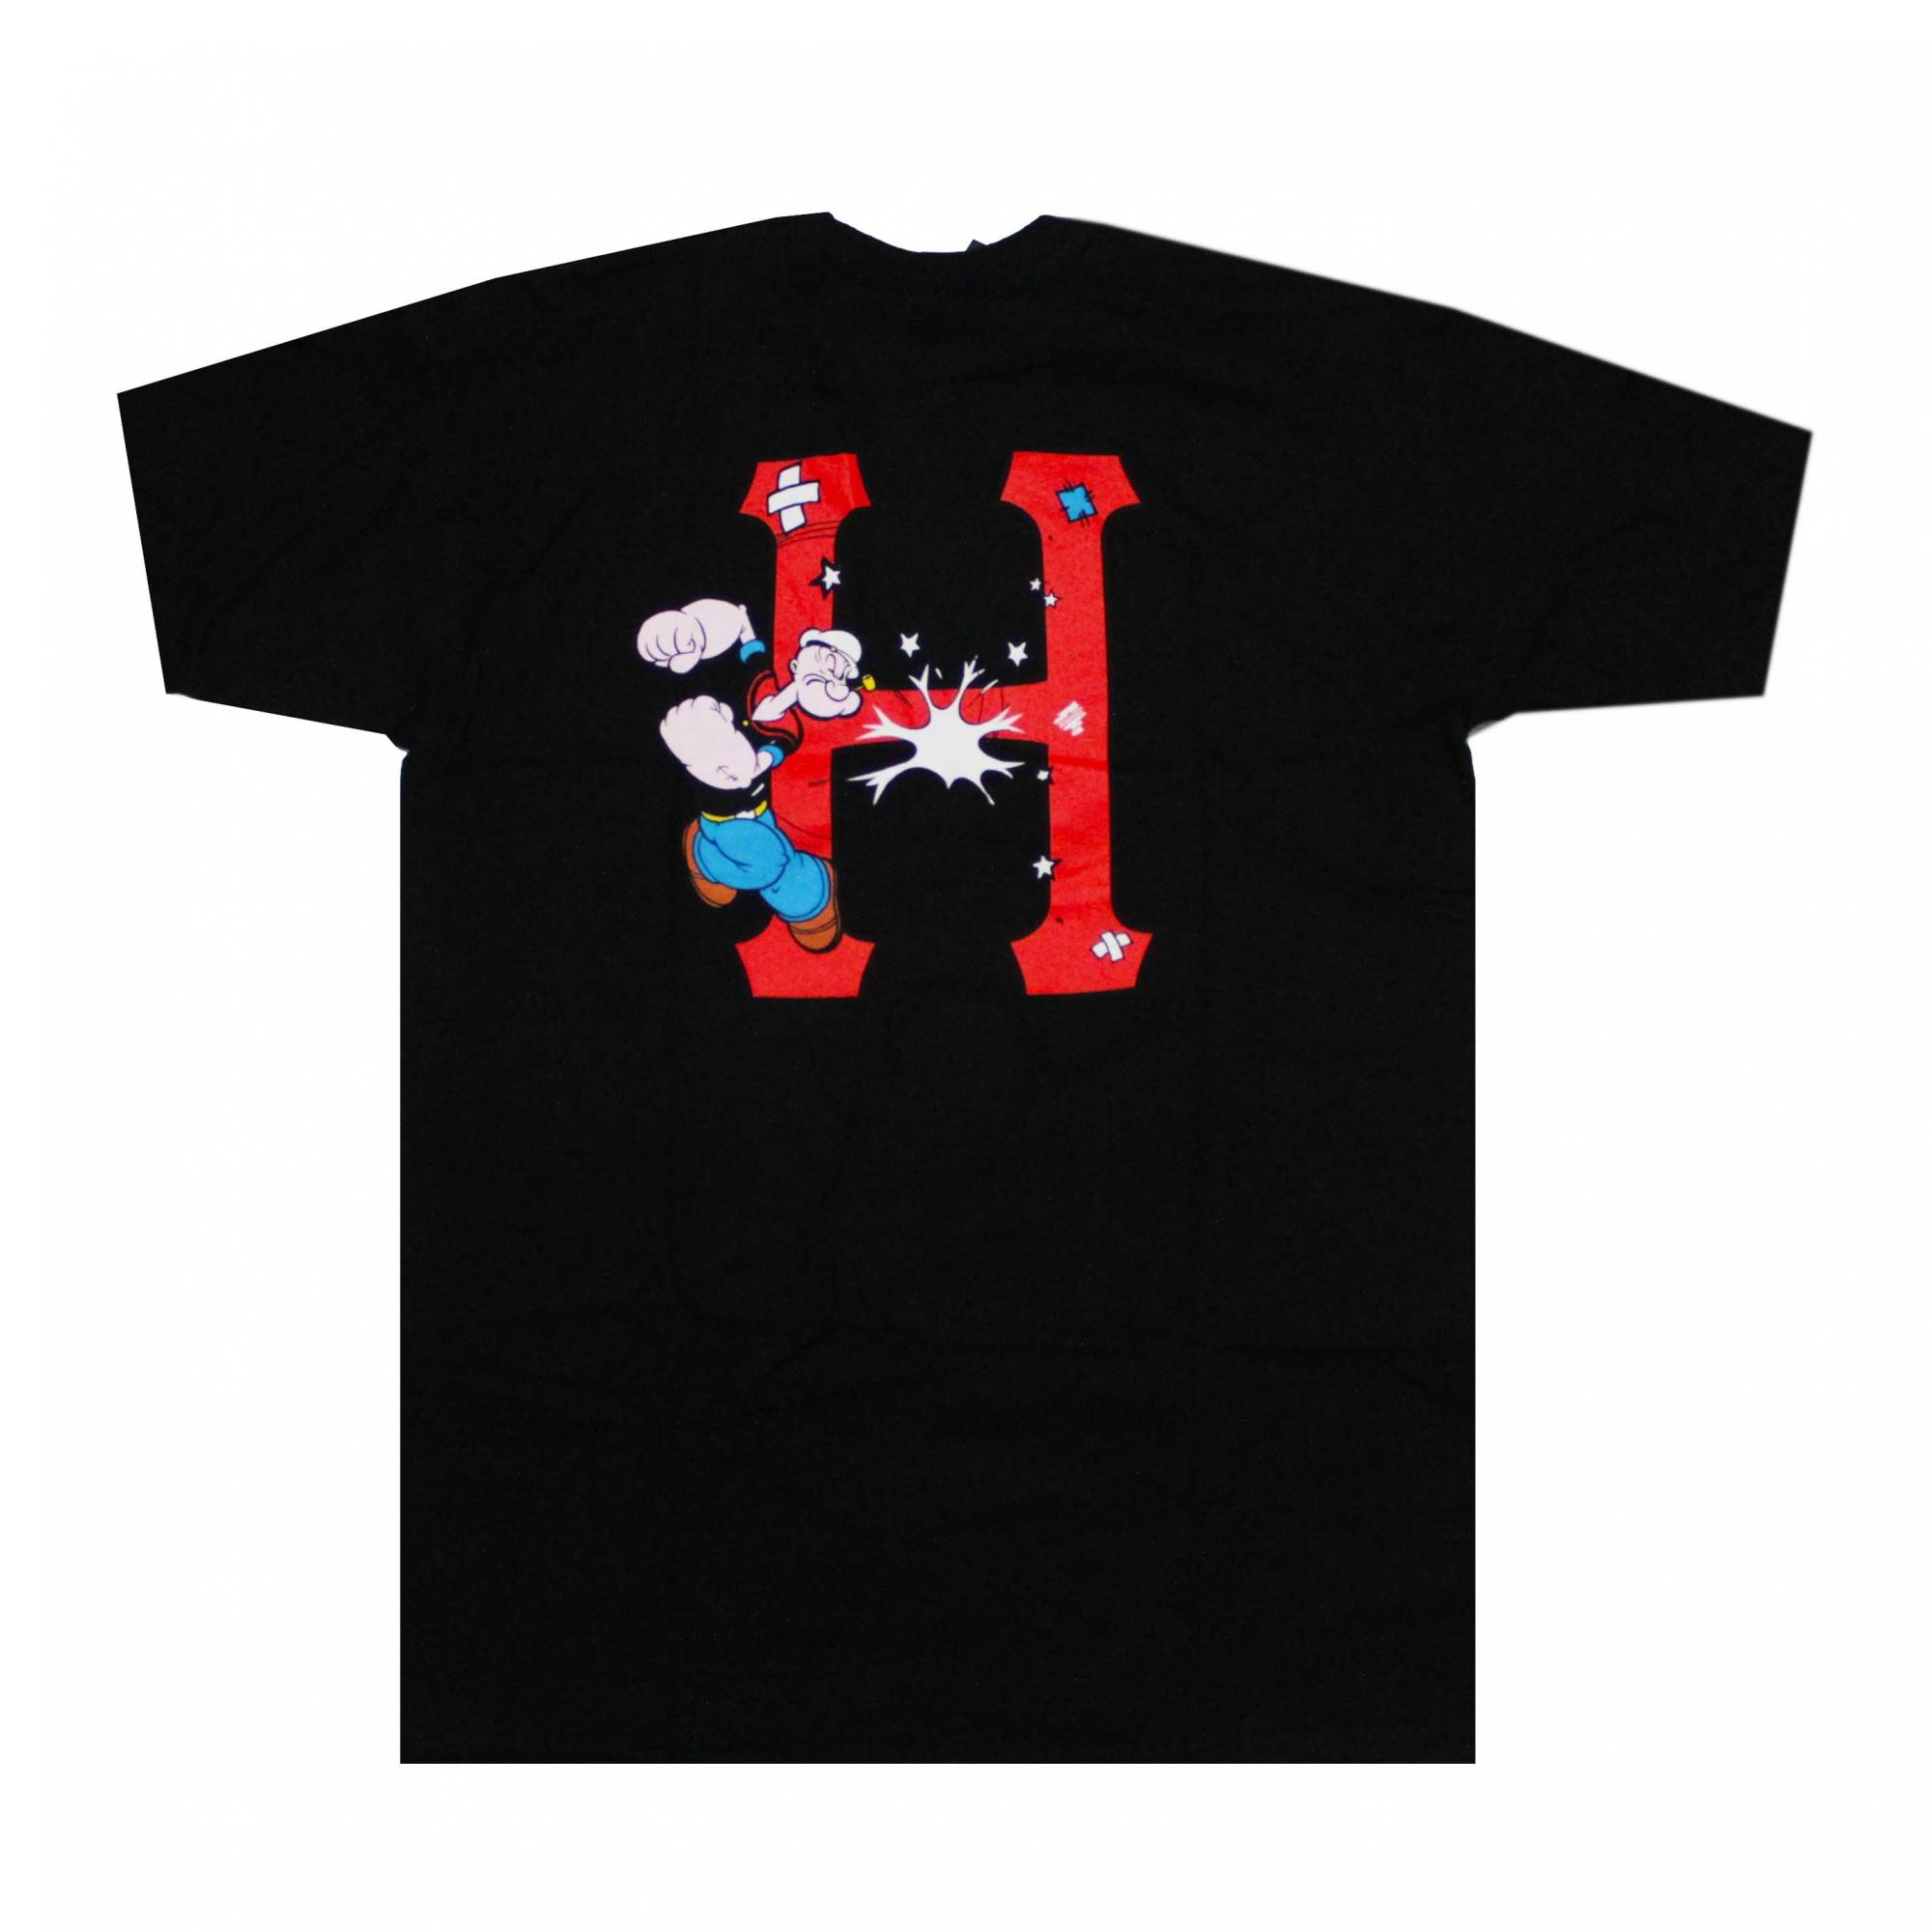 Camiseta HUF x Popeye Classic - Preto (Importado)